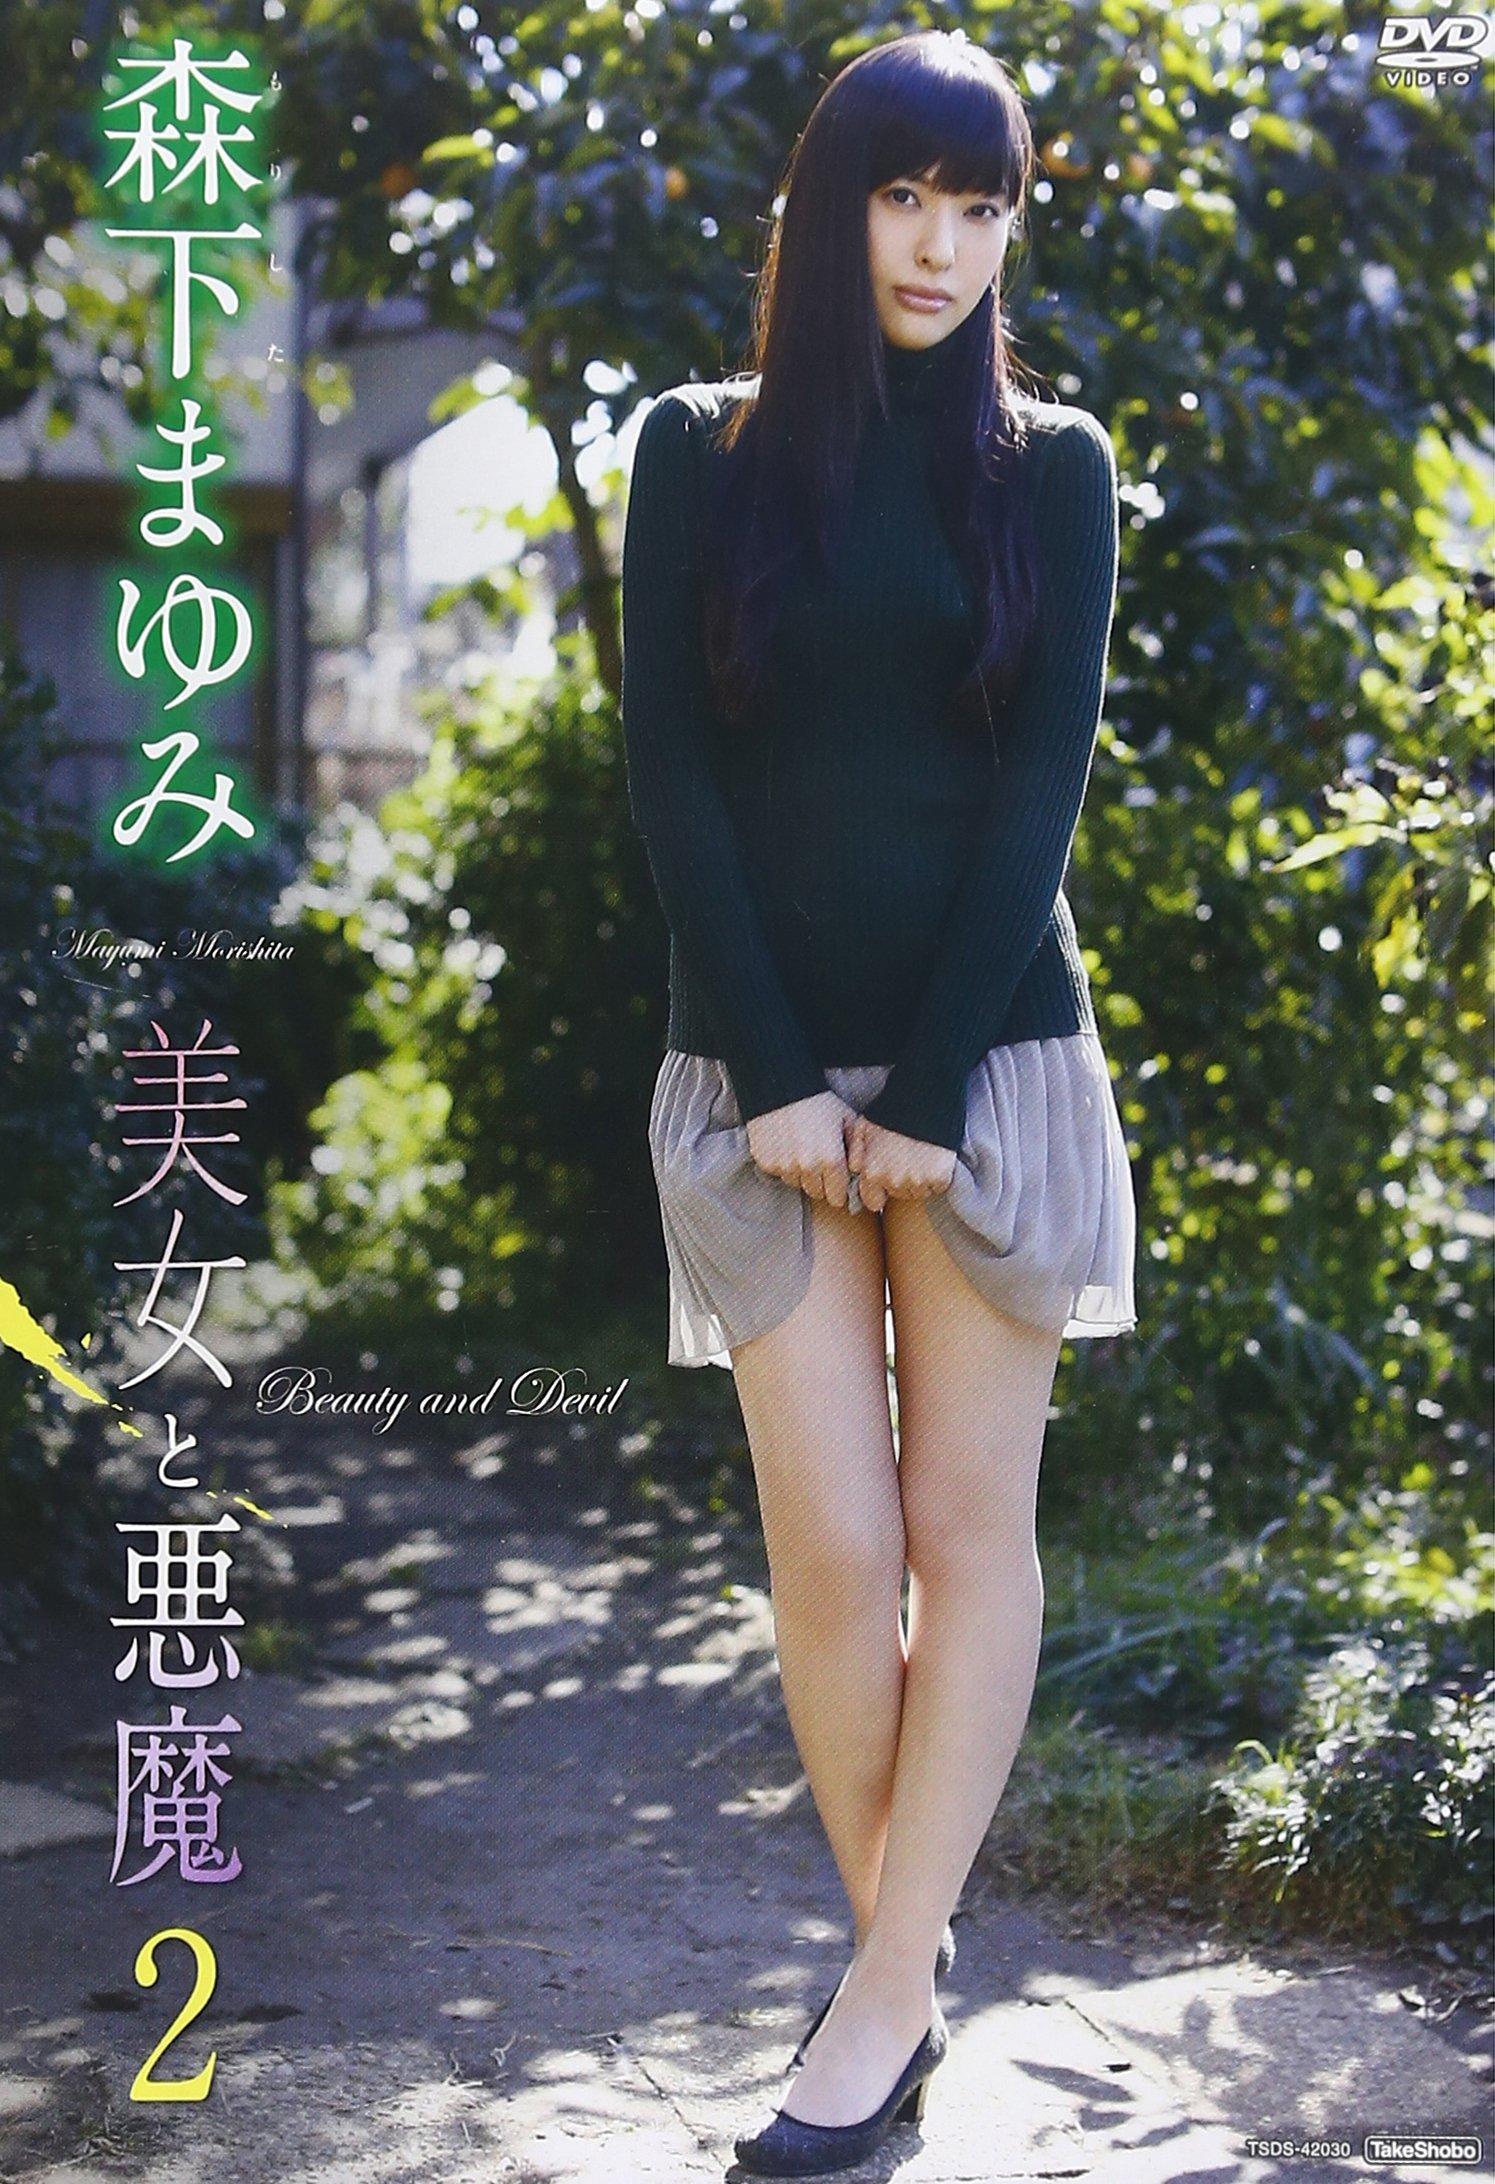 [TSDS-42030] Mayumi Morishita 森下まゆみ 美女と悪魔2